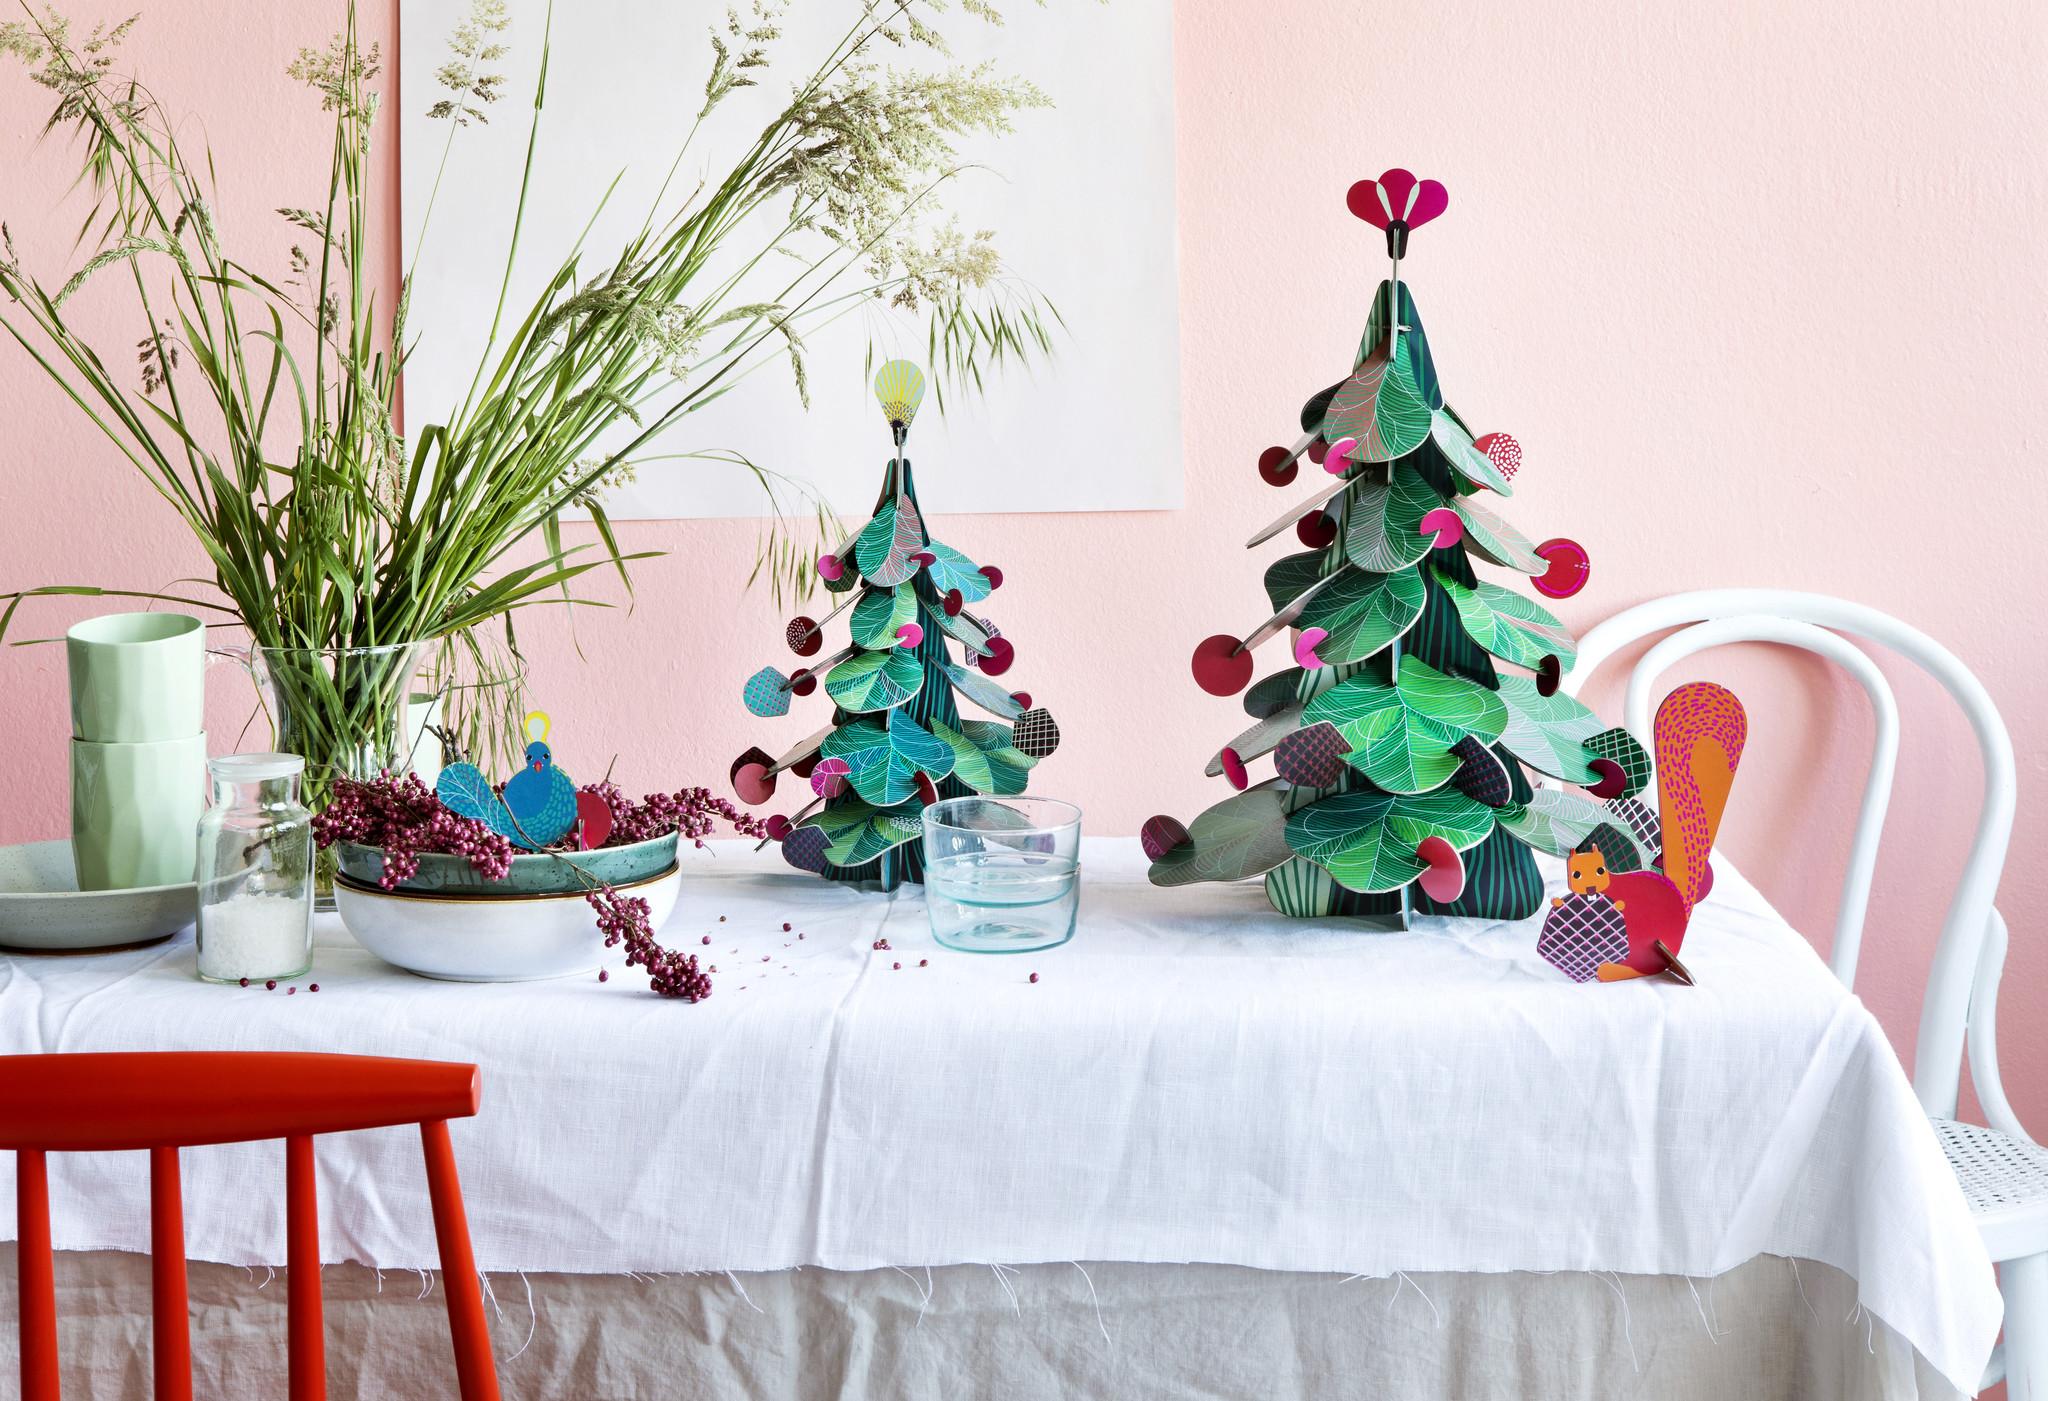 Studio Roof Bouwpakket Christmas Tree Peacock